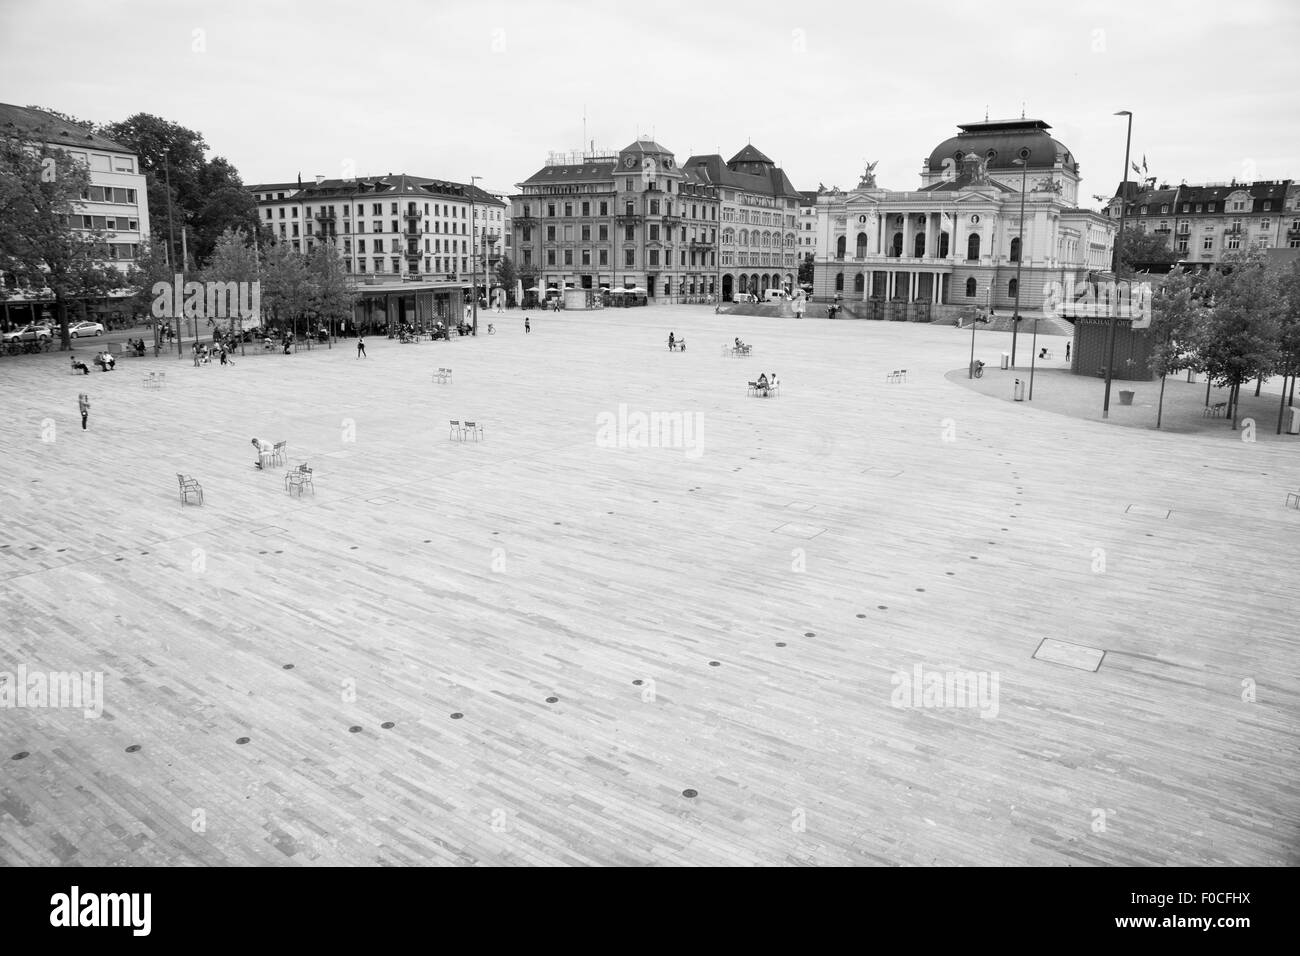 Cityscape in Zurich - Stock Image